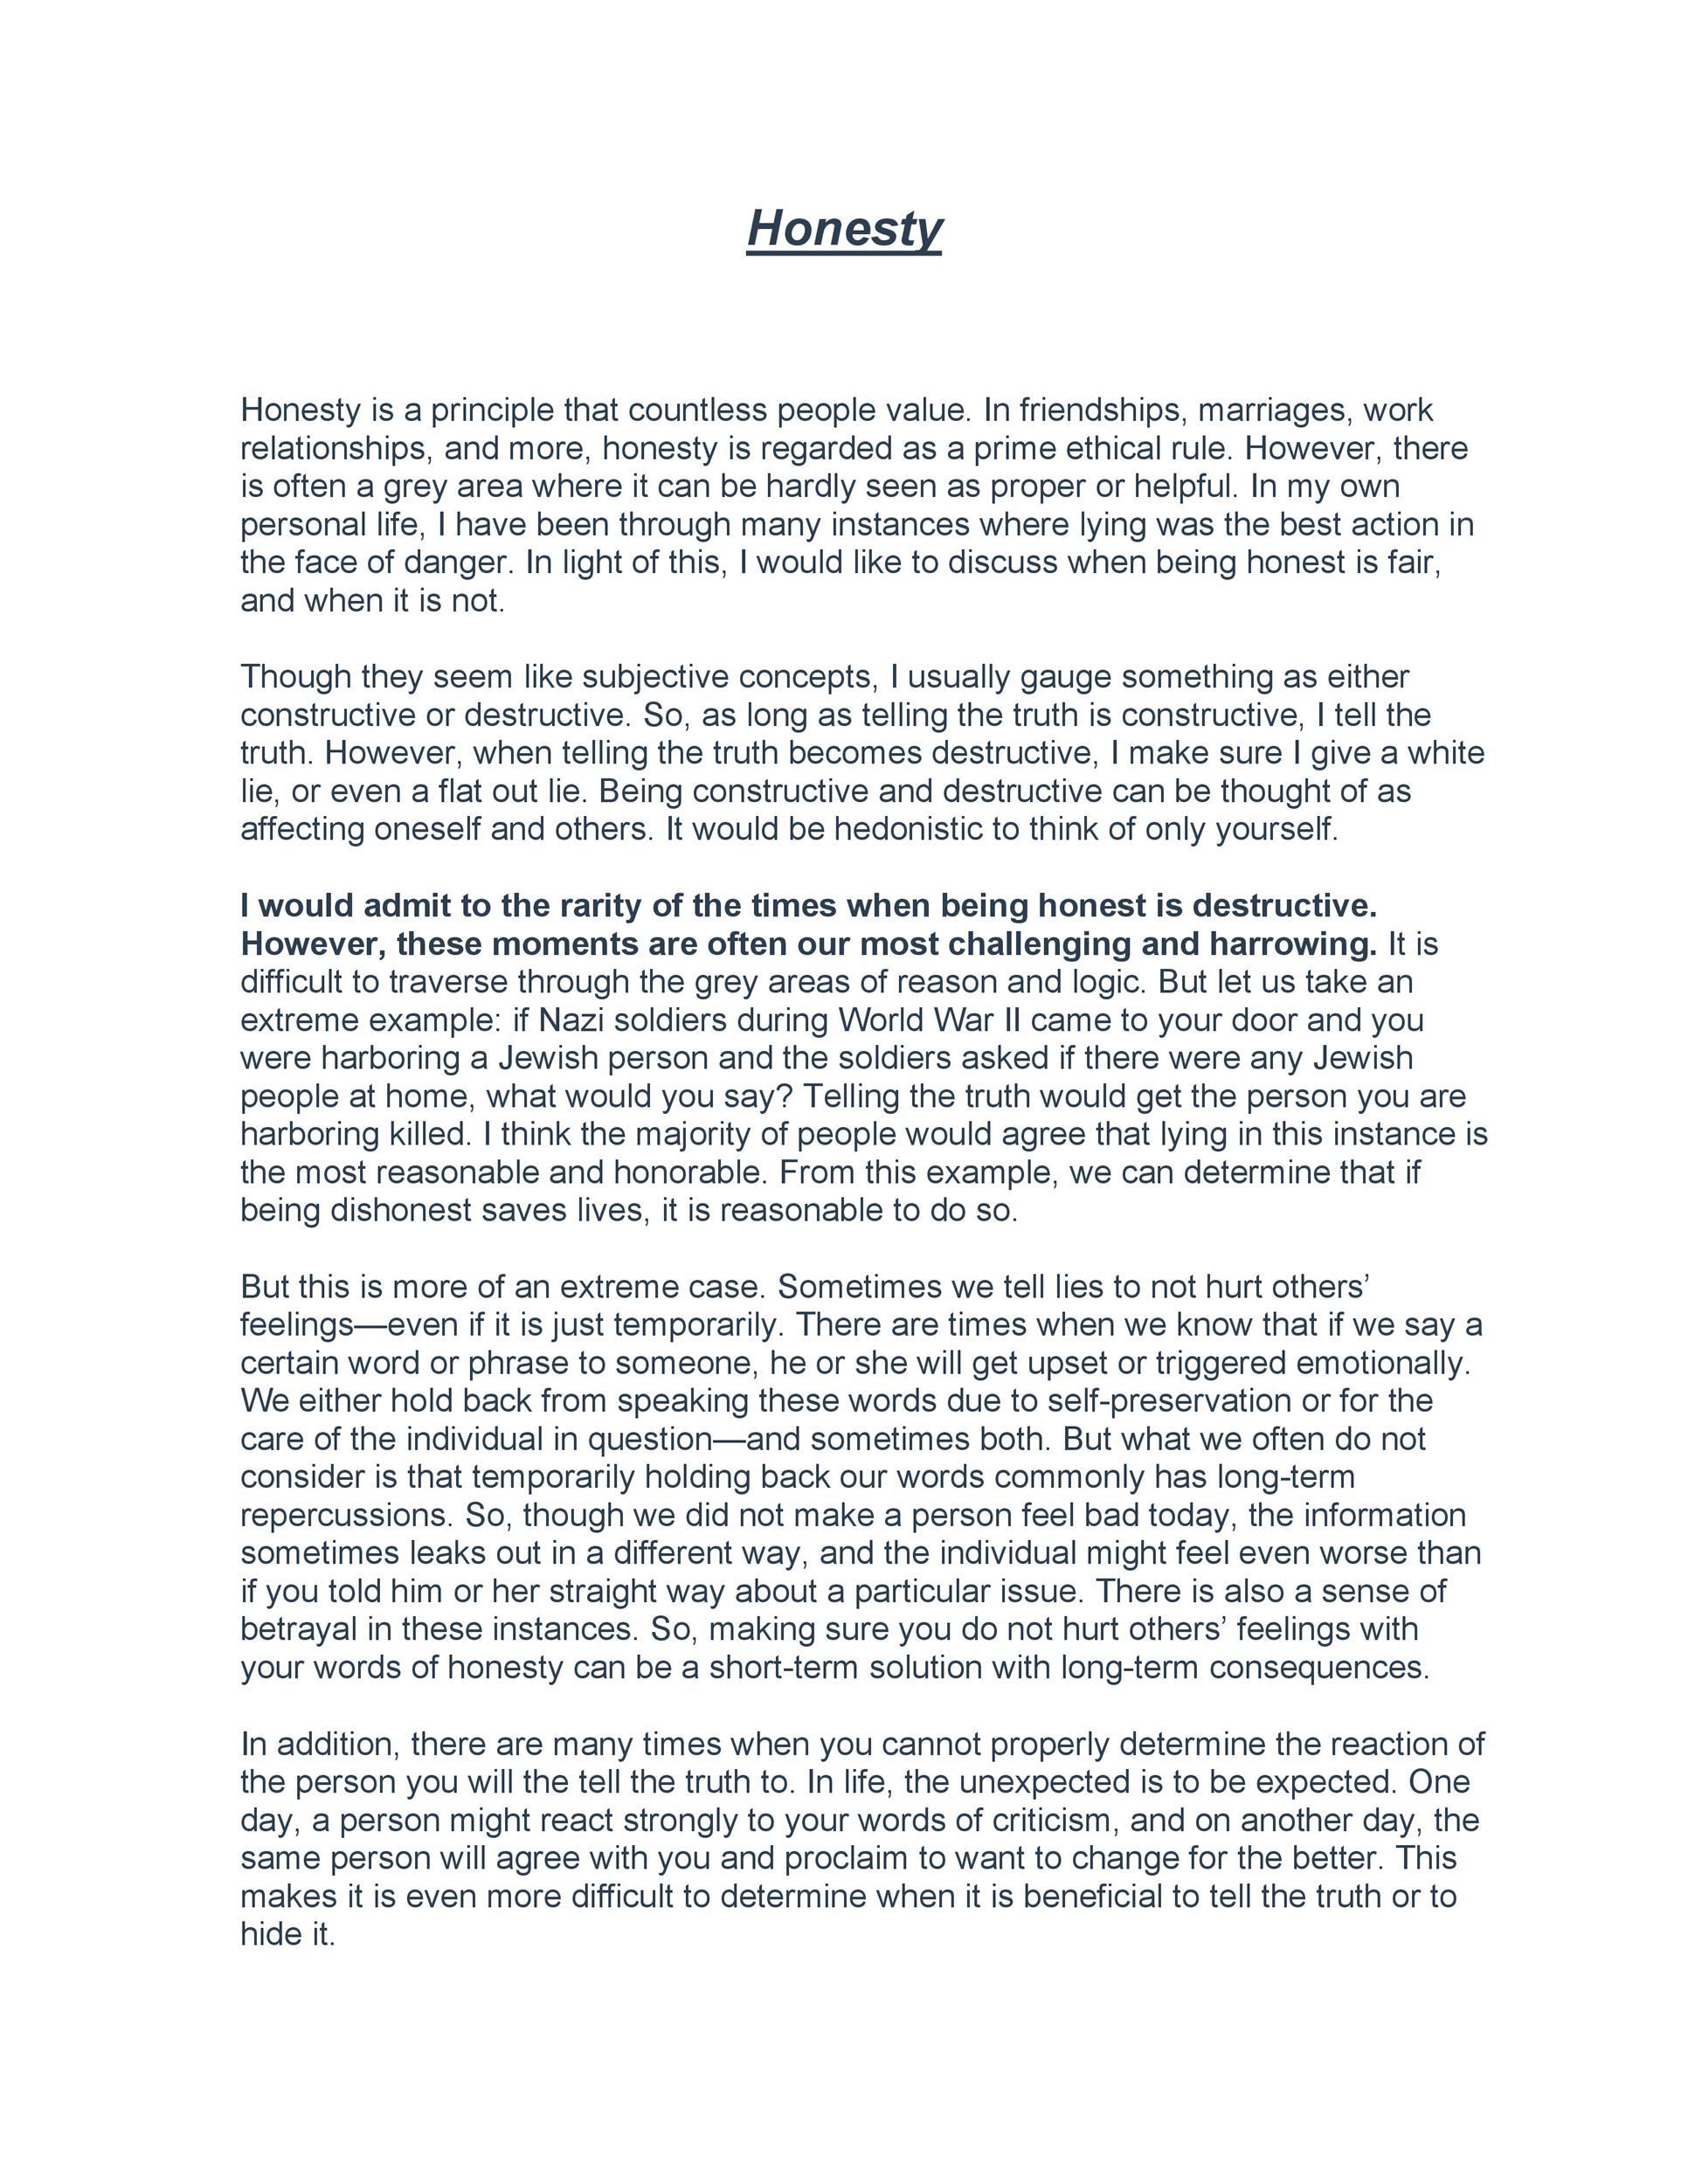 Free reflective essay example 44